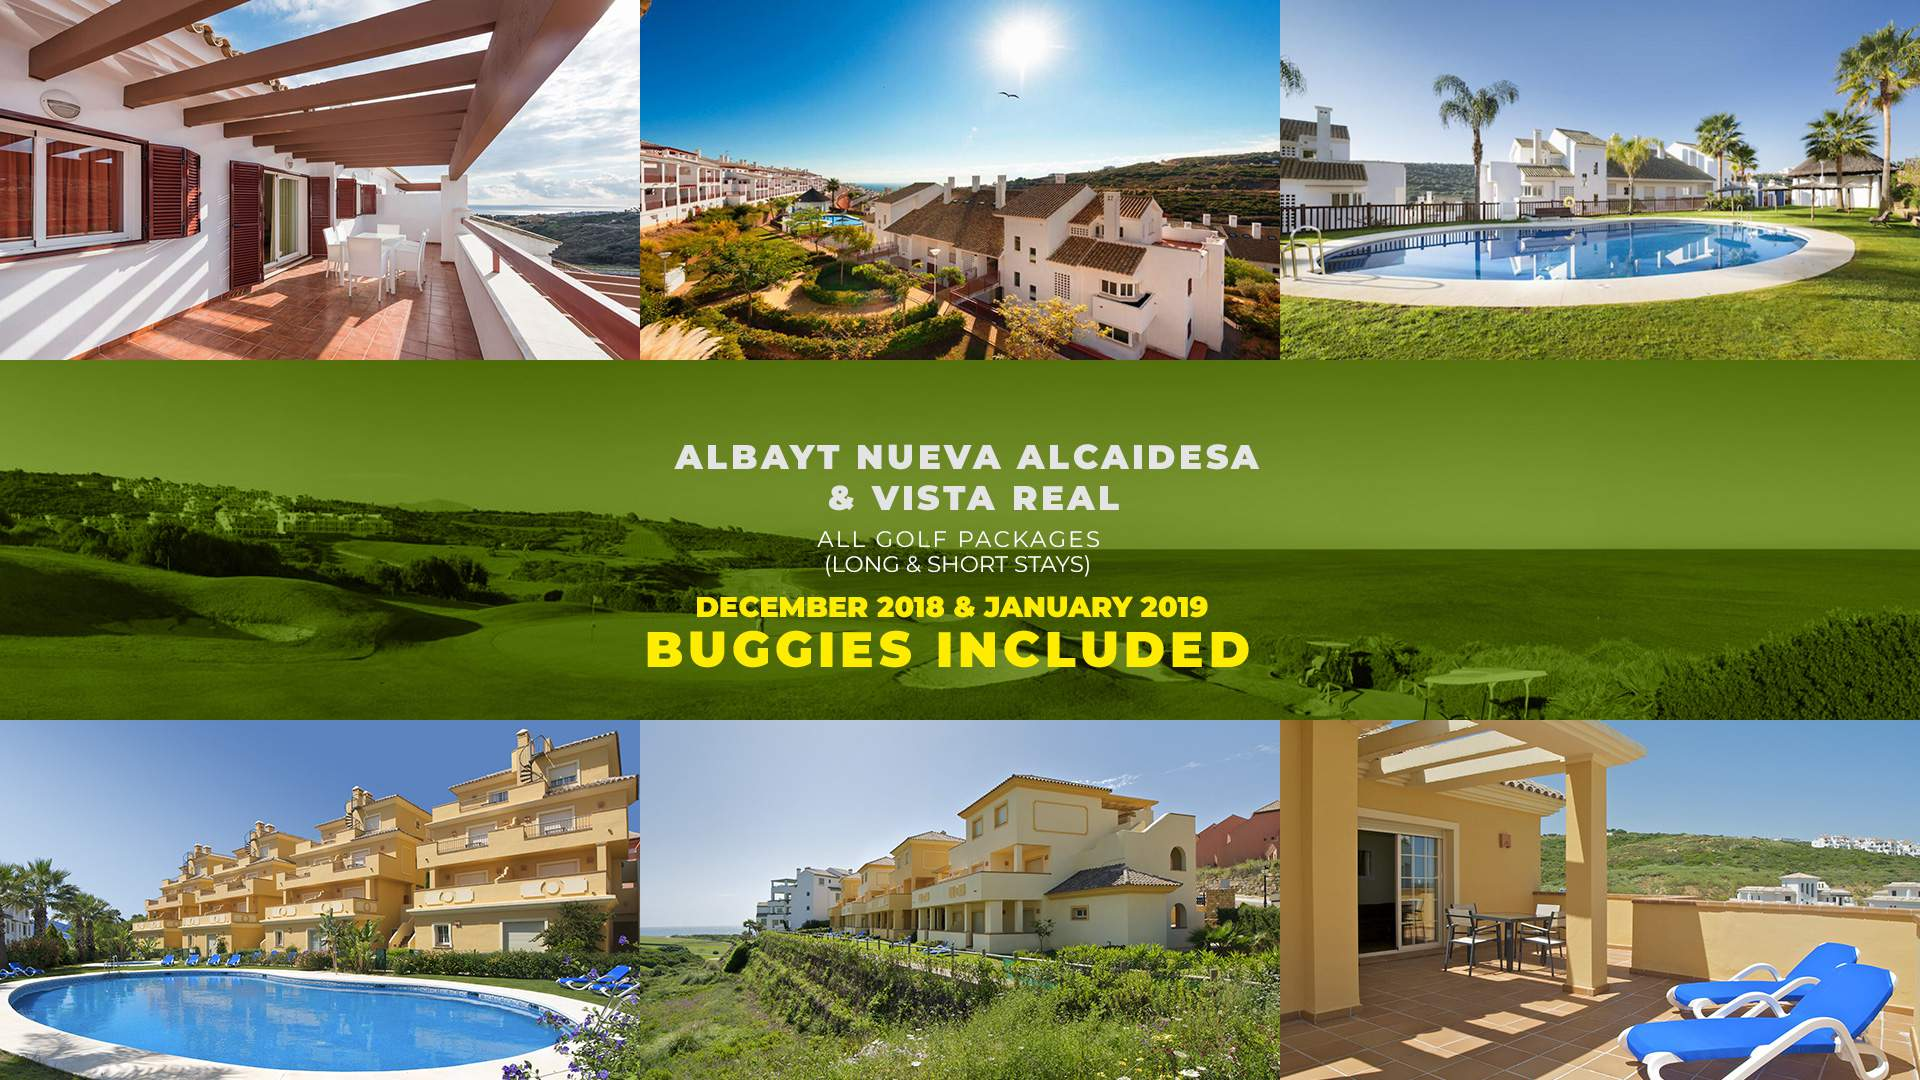 image Promo accomodation and golf Vista Real and Albayt Nueva Alcaidesa